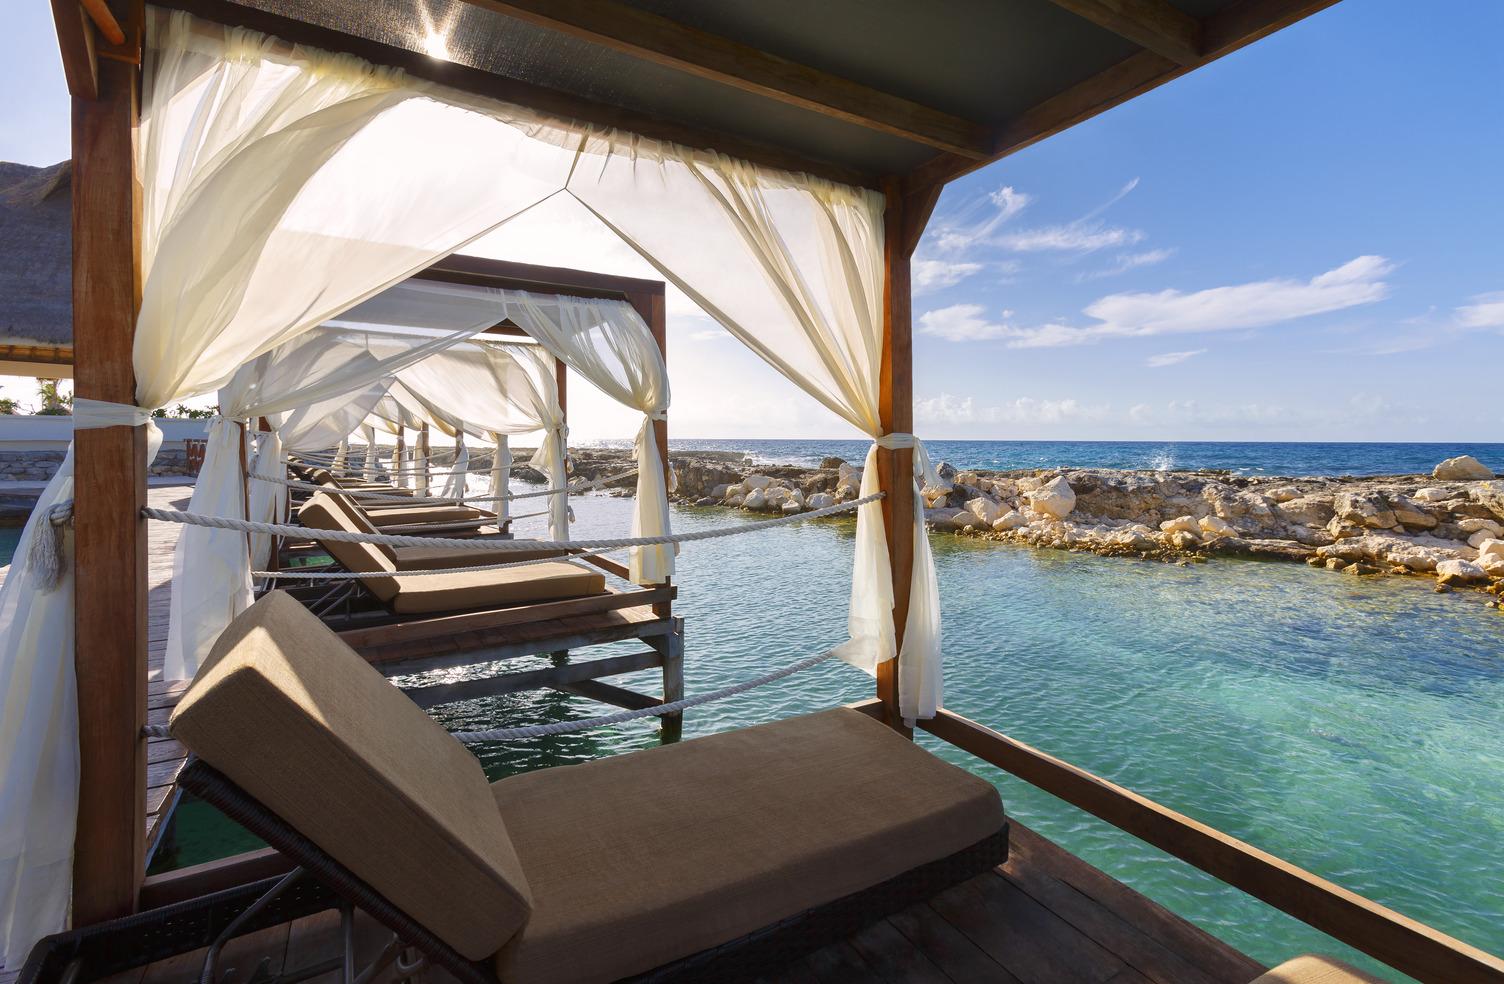 Travel Agency All-Inclusive Resort Heaven at Hard Rock Hotel Riviera Maya 13